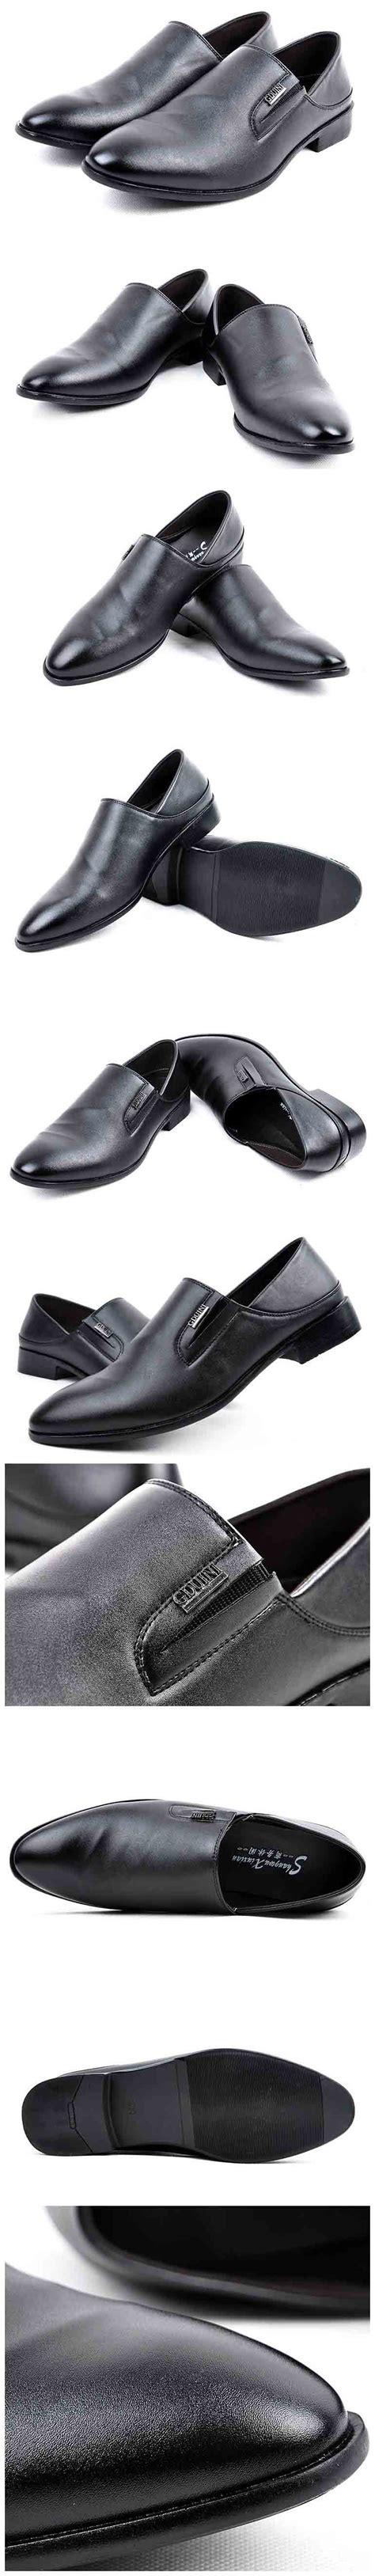 Bahan Adem Glosy Celana Kantor Pria Cowo Model Slimfit High Quality jual sepatu kantor pria